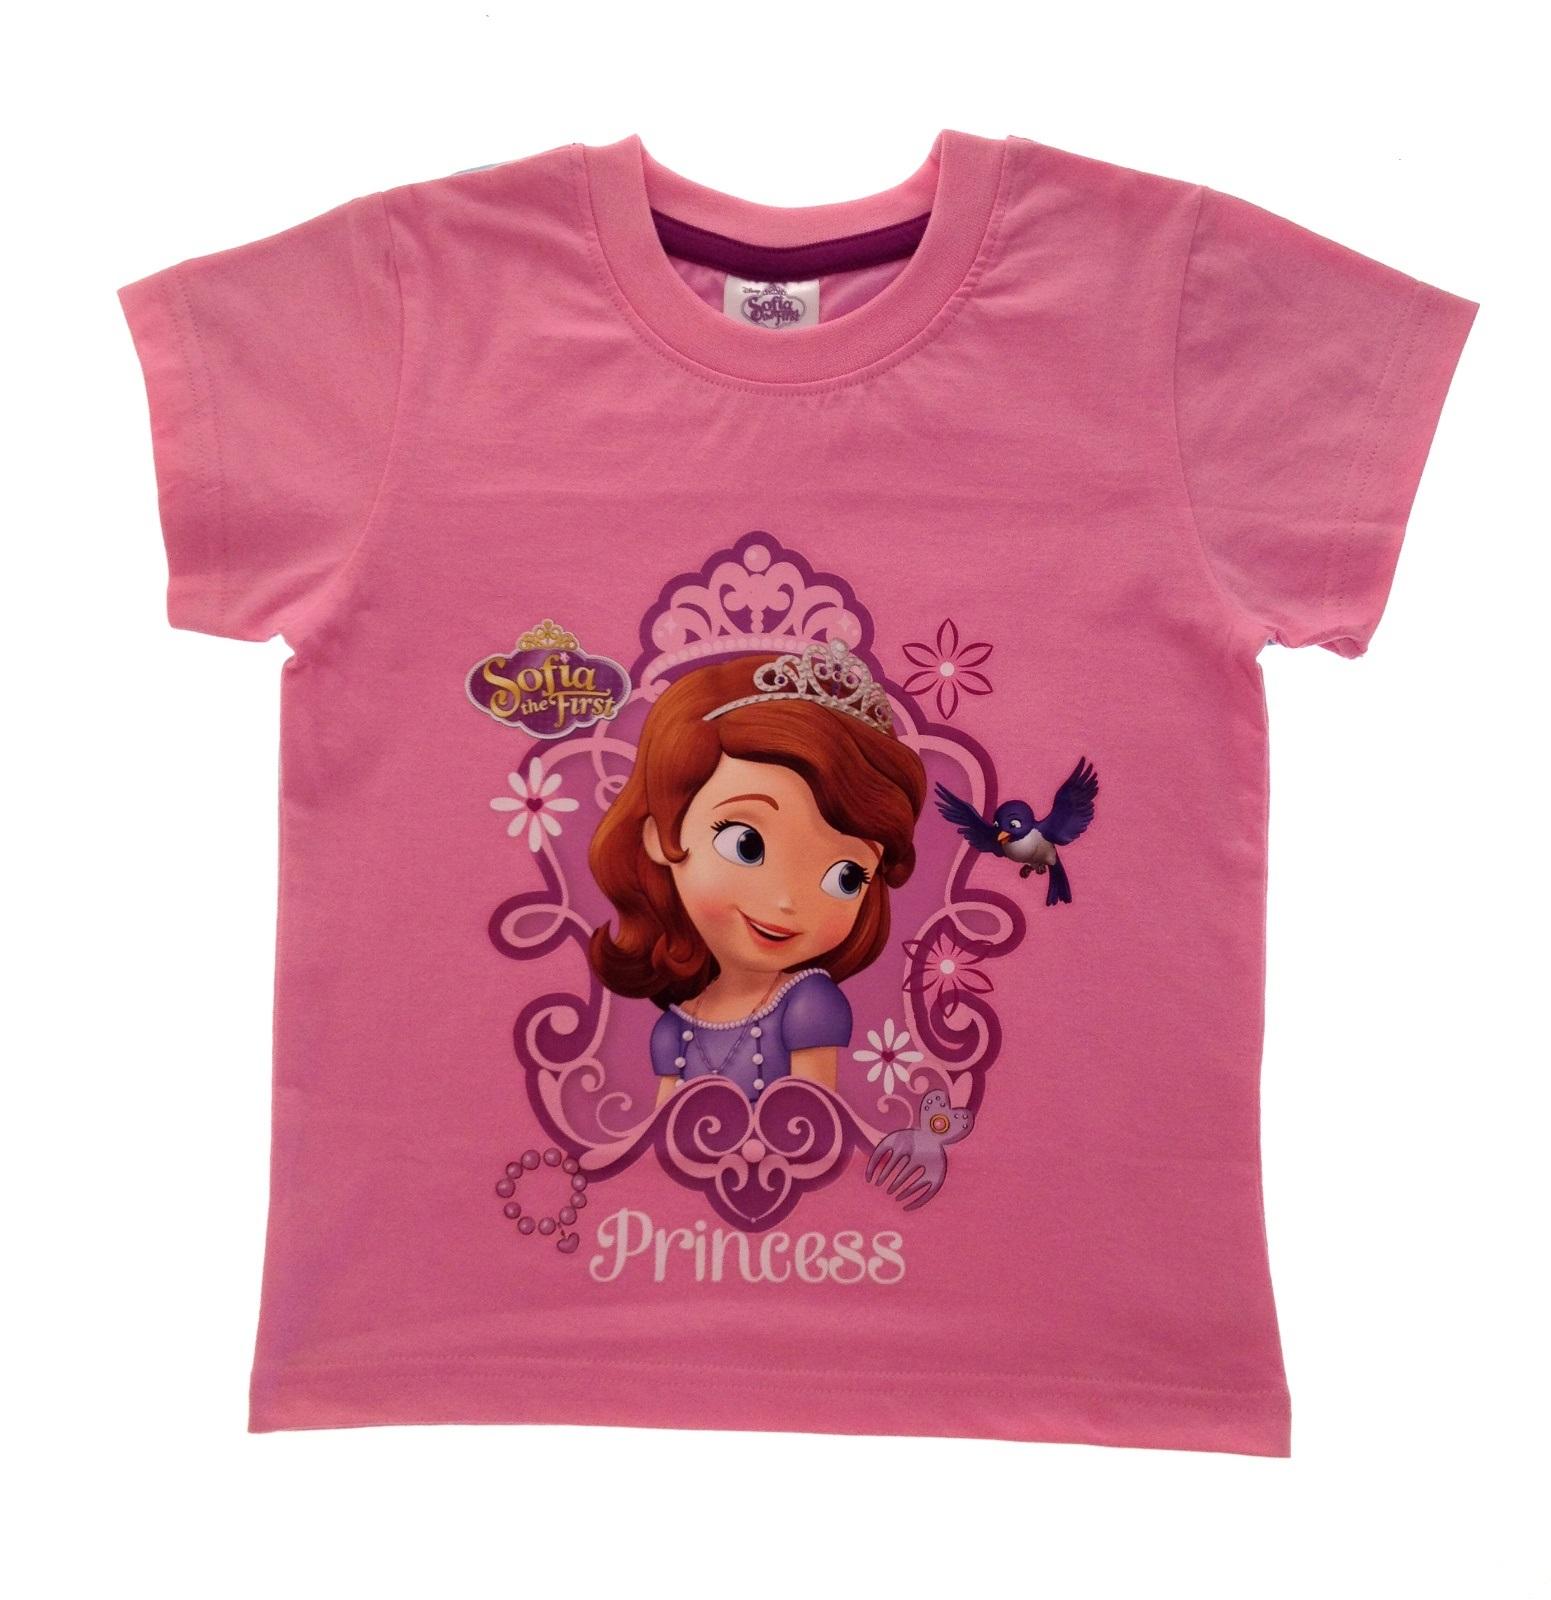 04f58fc83 Disney Princess Sofia T Shirt Short Sleeved Top Girls Clothing Kids ...